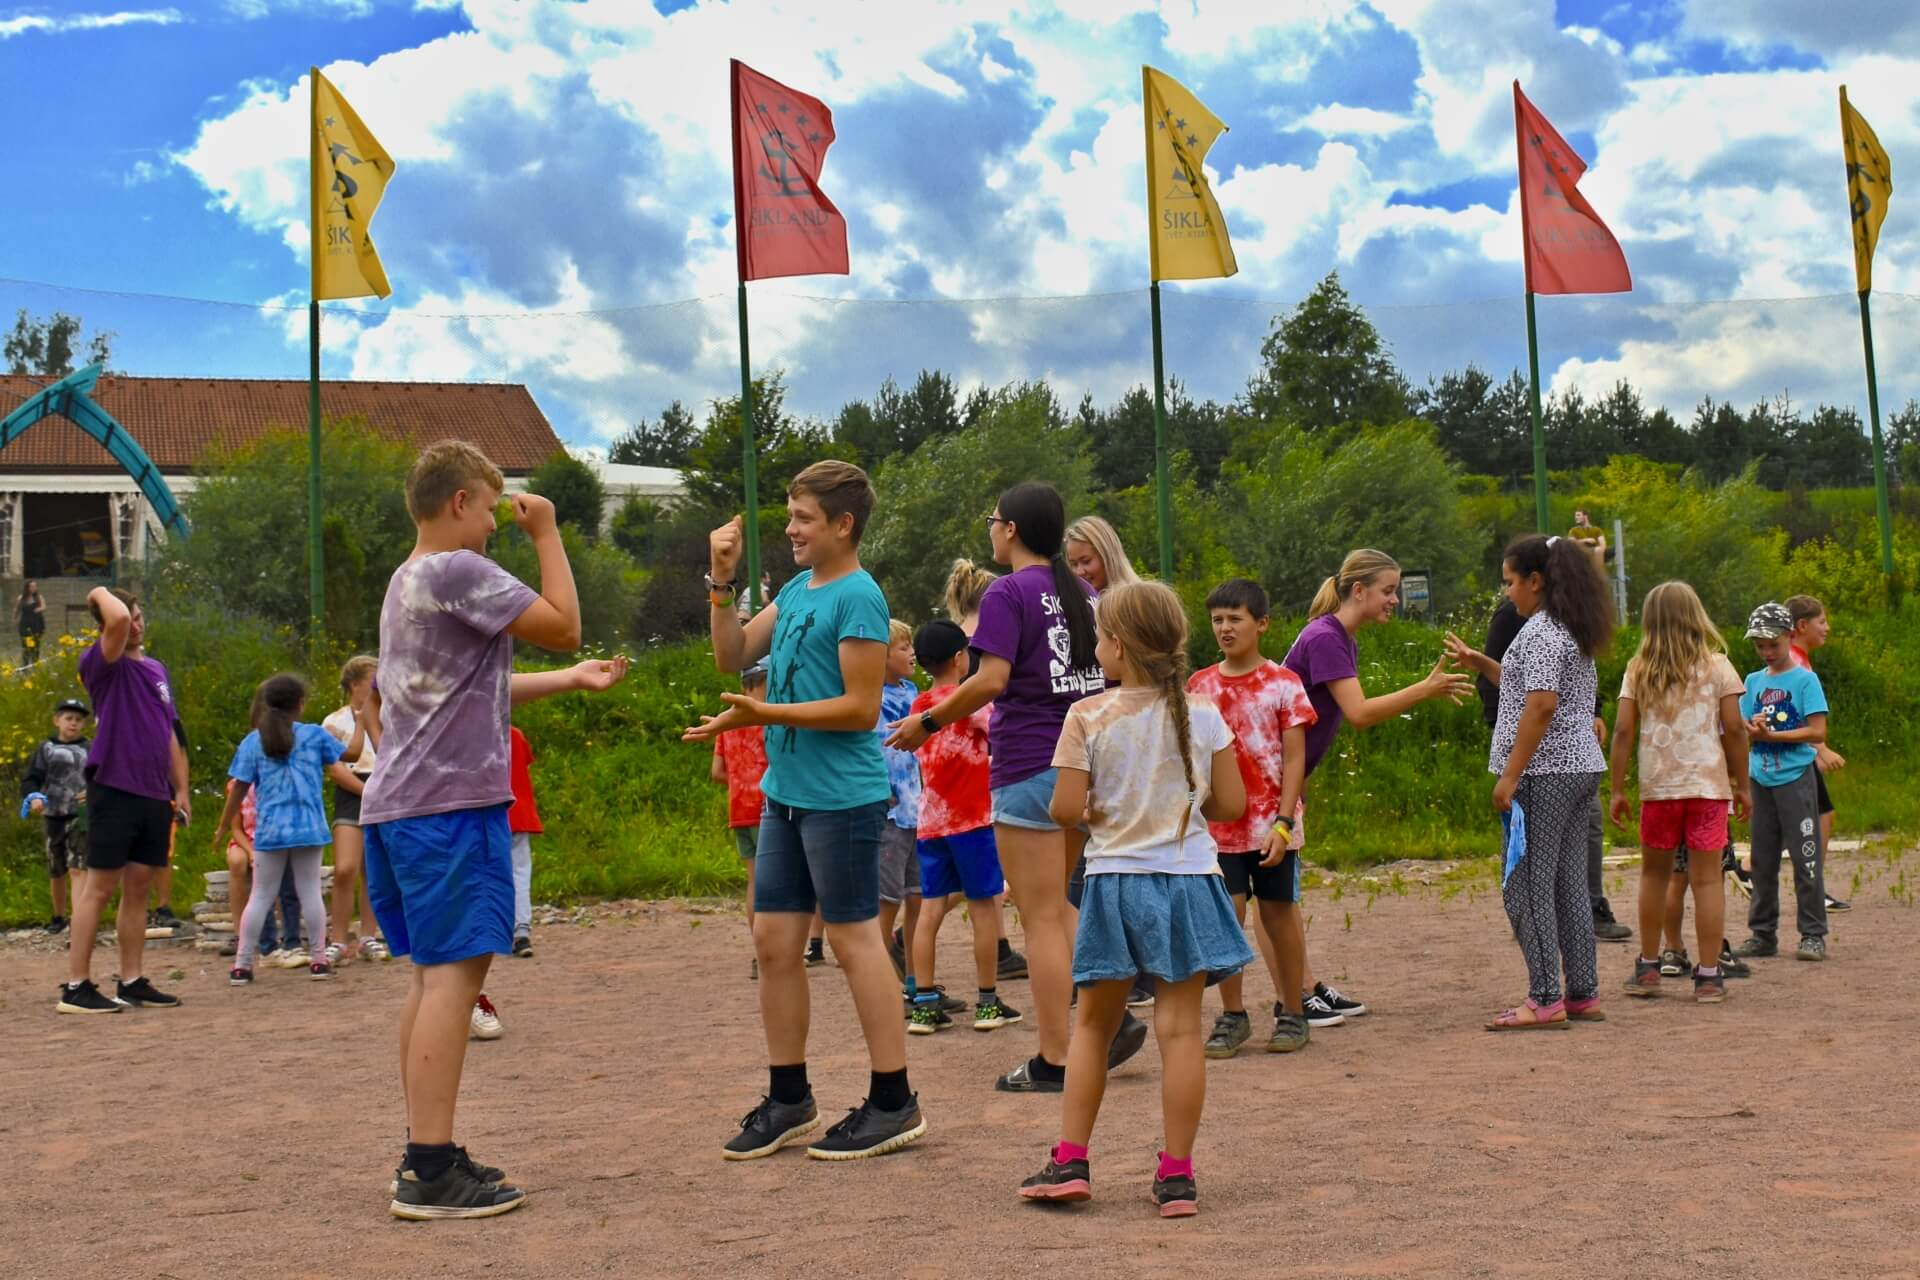 detsky_tabor_vysocina_sikluv_mlyn_hry